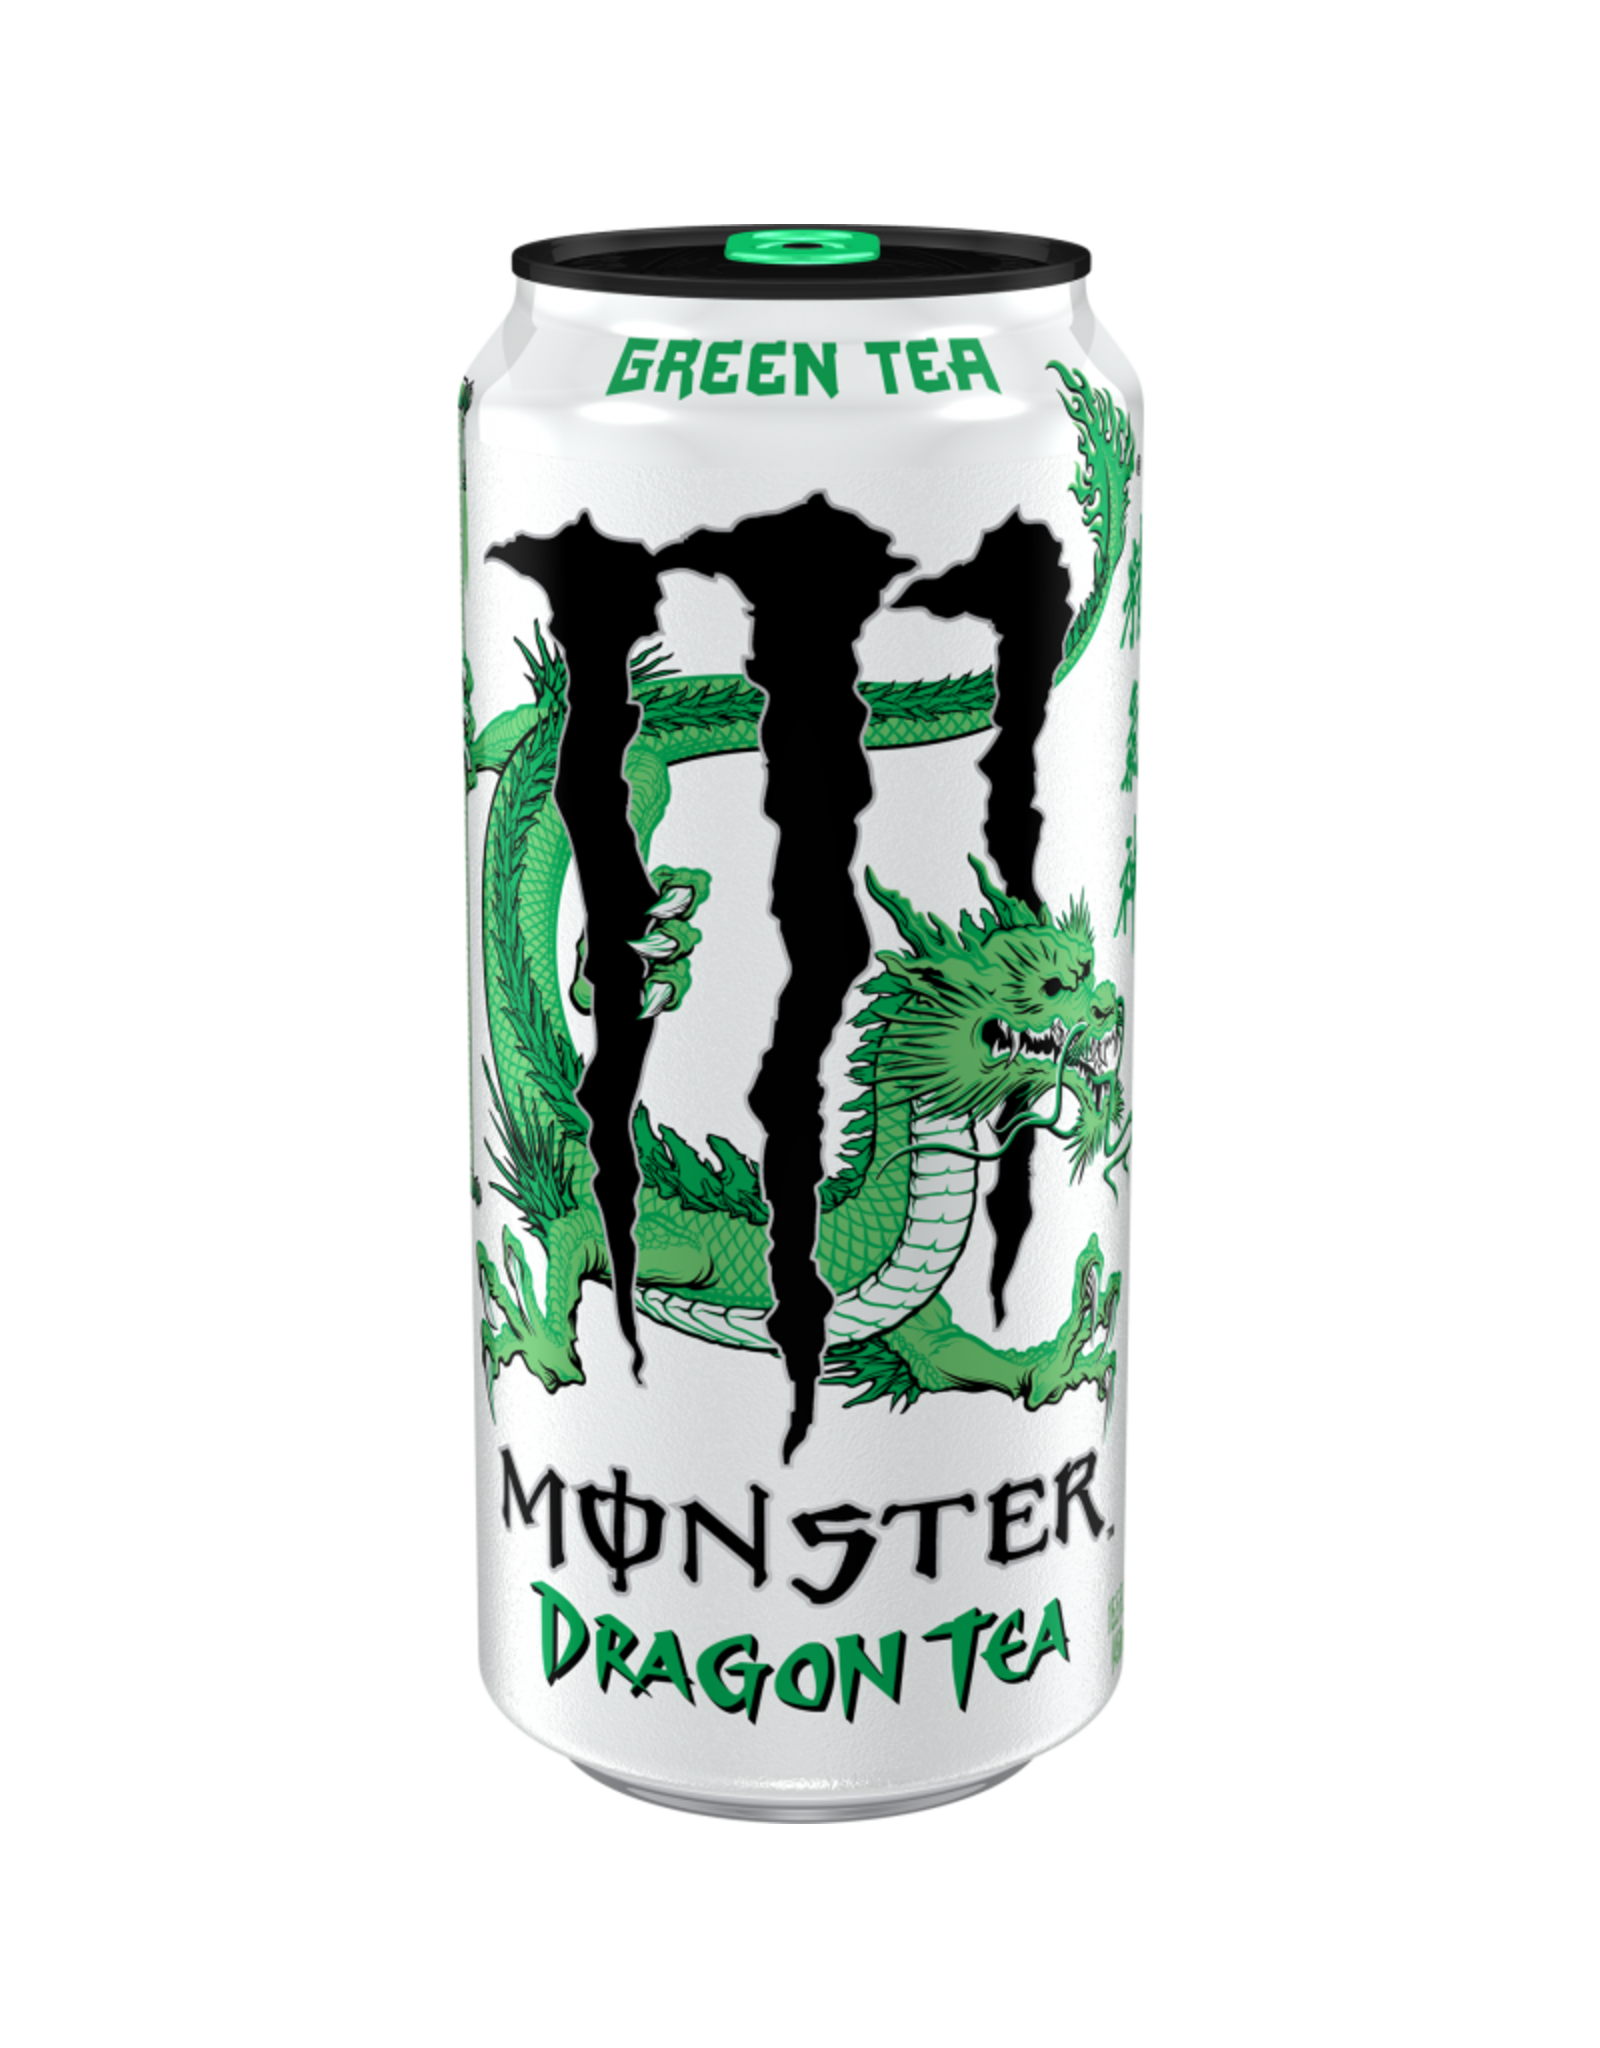 Monster Dragon Tea - Green Tea (import) - 458ml